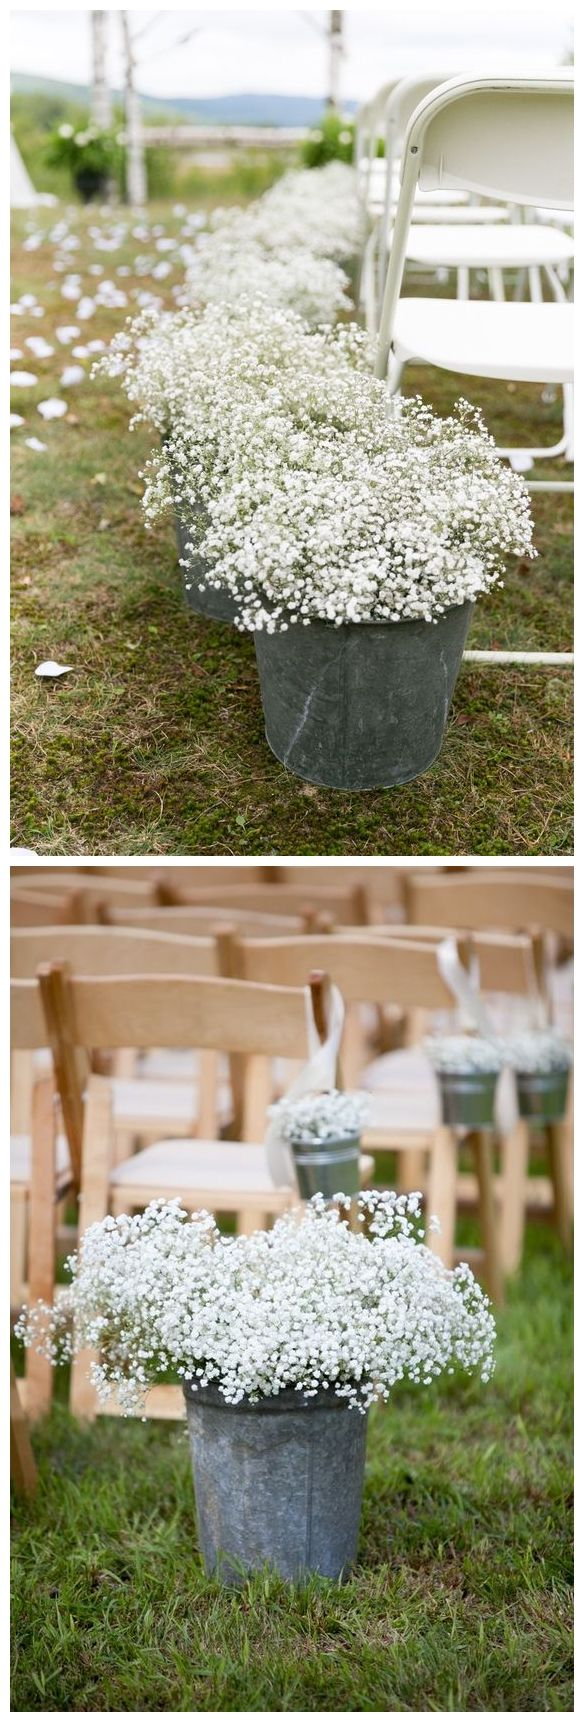 rustic country bucket wedding ideas #weddings #weddingideas   #dpf #deerpearlflowers #countrywedding #country #rusticwedding / http://www.deerpearlflowers.com/rustic-buckets-tubs-wedding-ideas/